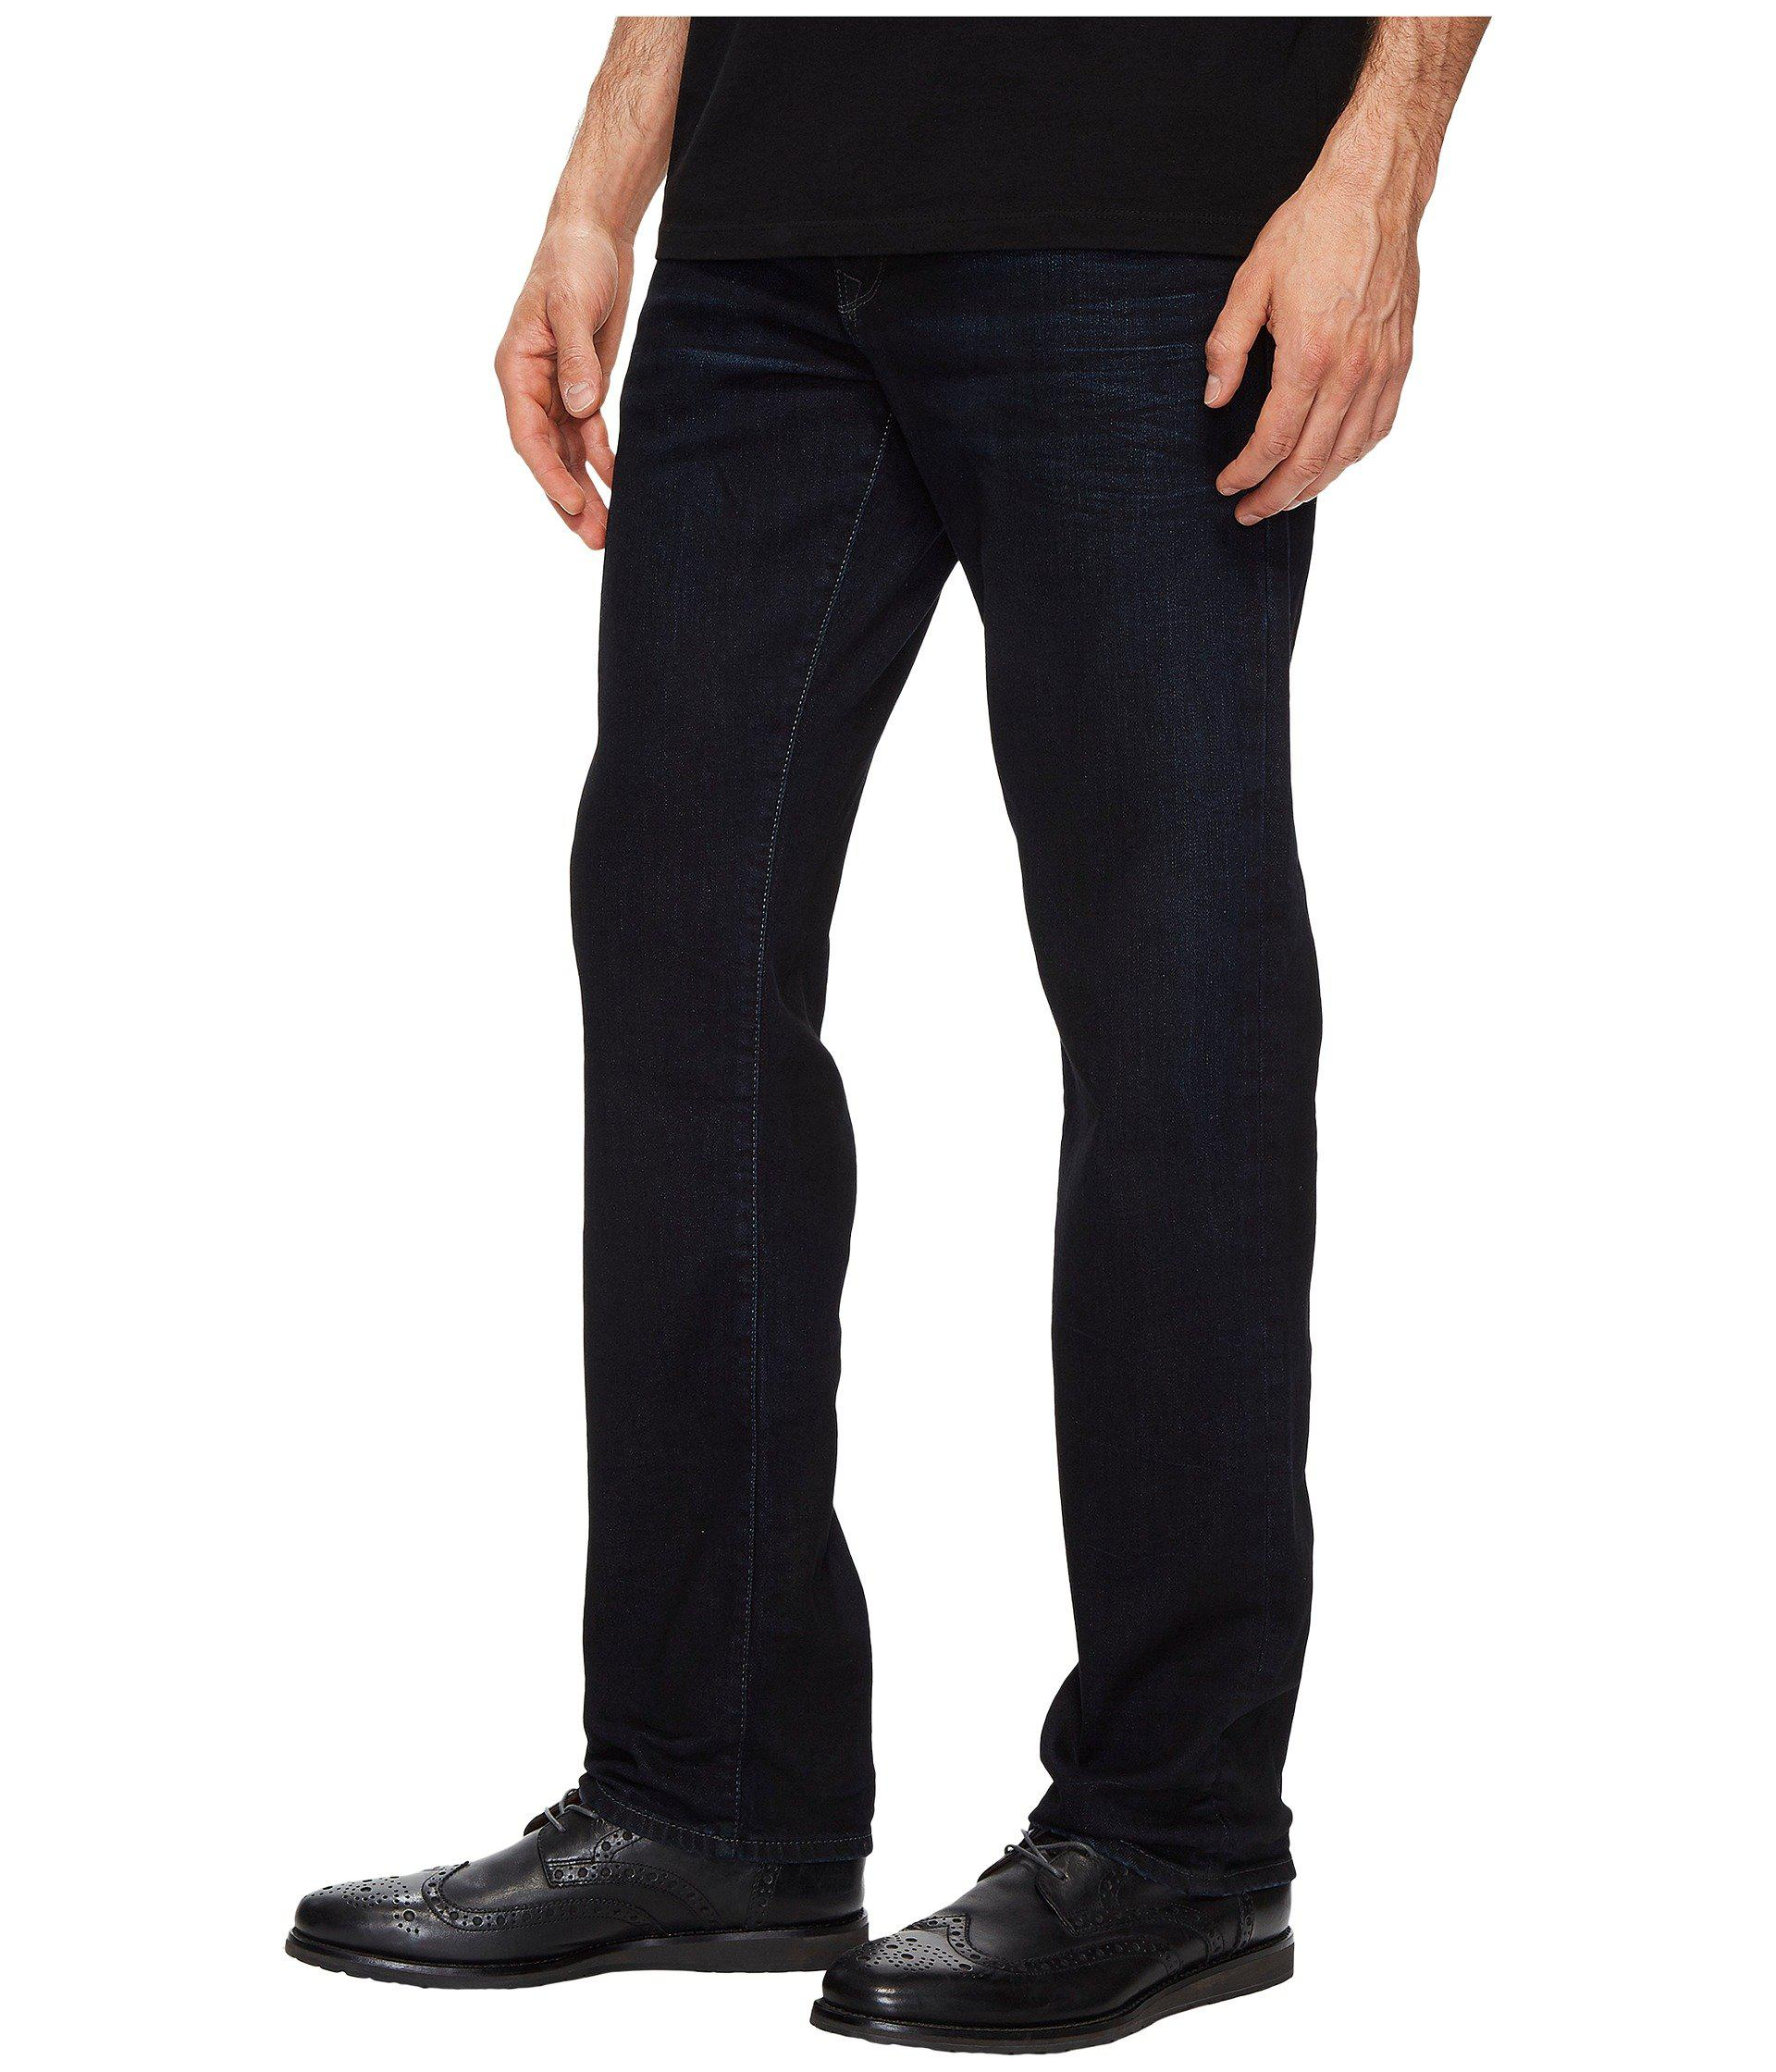 cfa25acdda84 Lyst - Mavi Jeans Zach Regular Rise Straight Leg In Coated Authentic  Vintage in Blue for Men